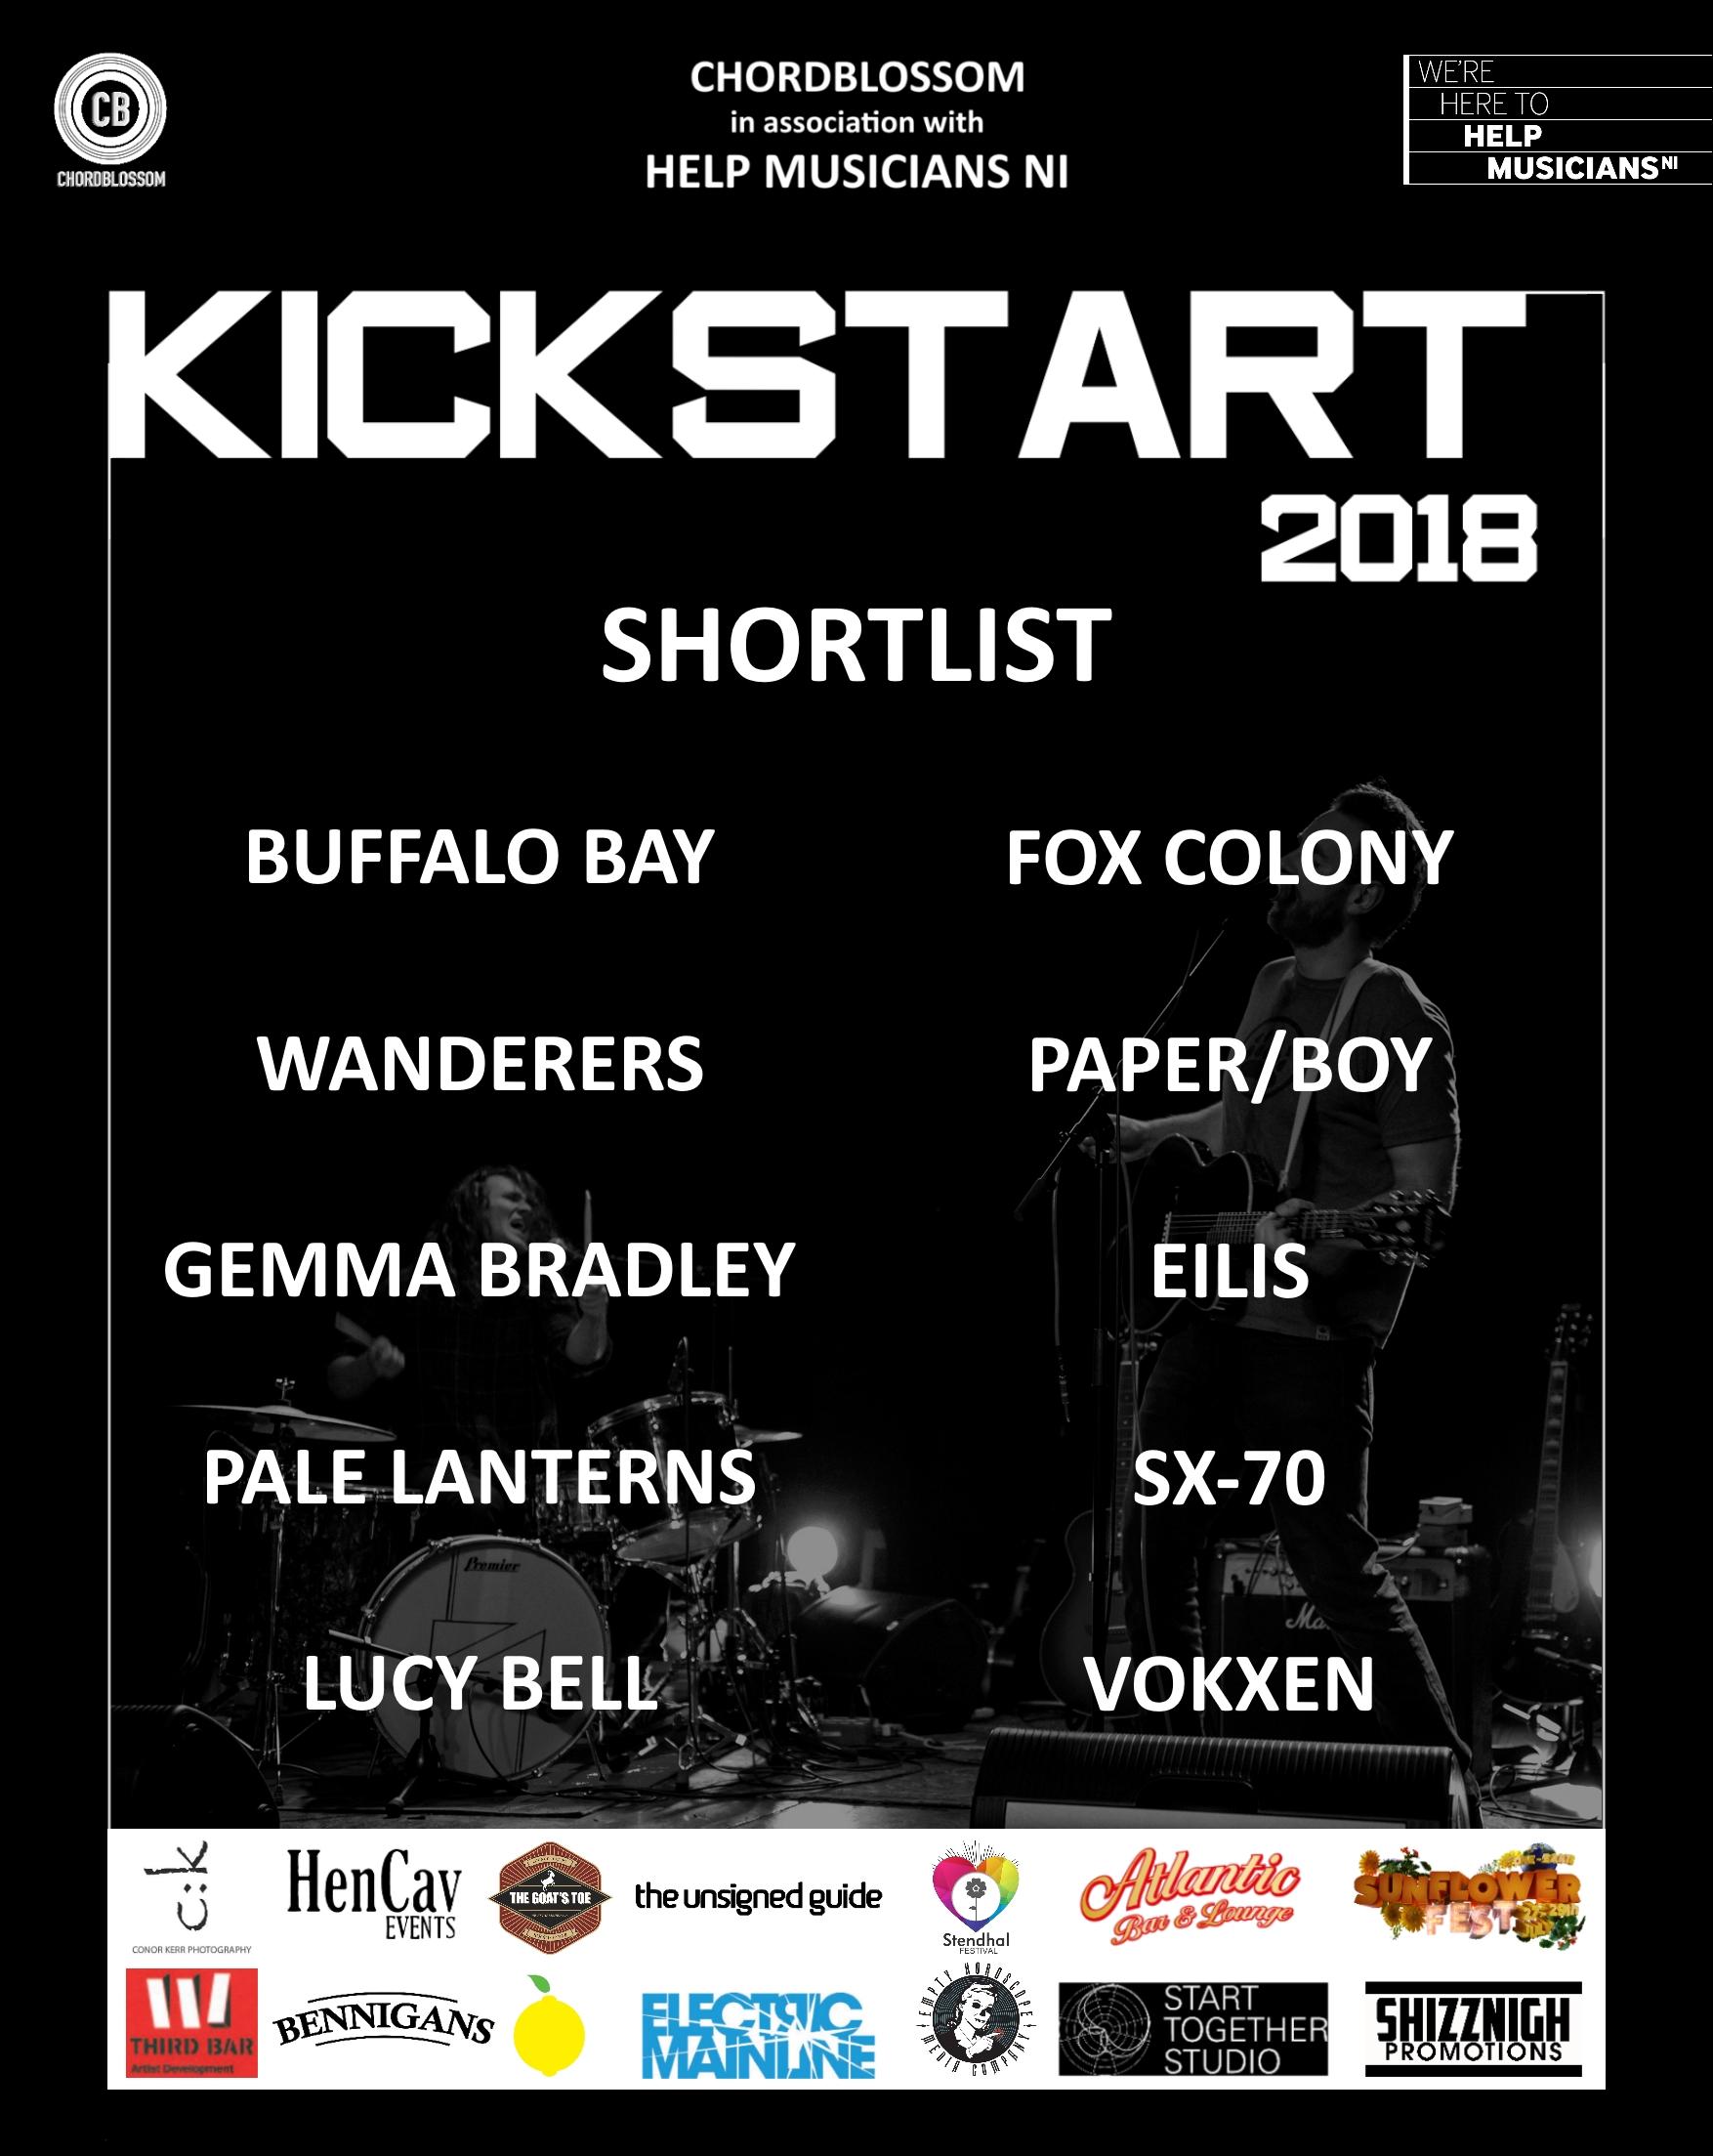 kickstart 2018 shortlist poster